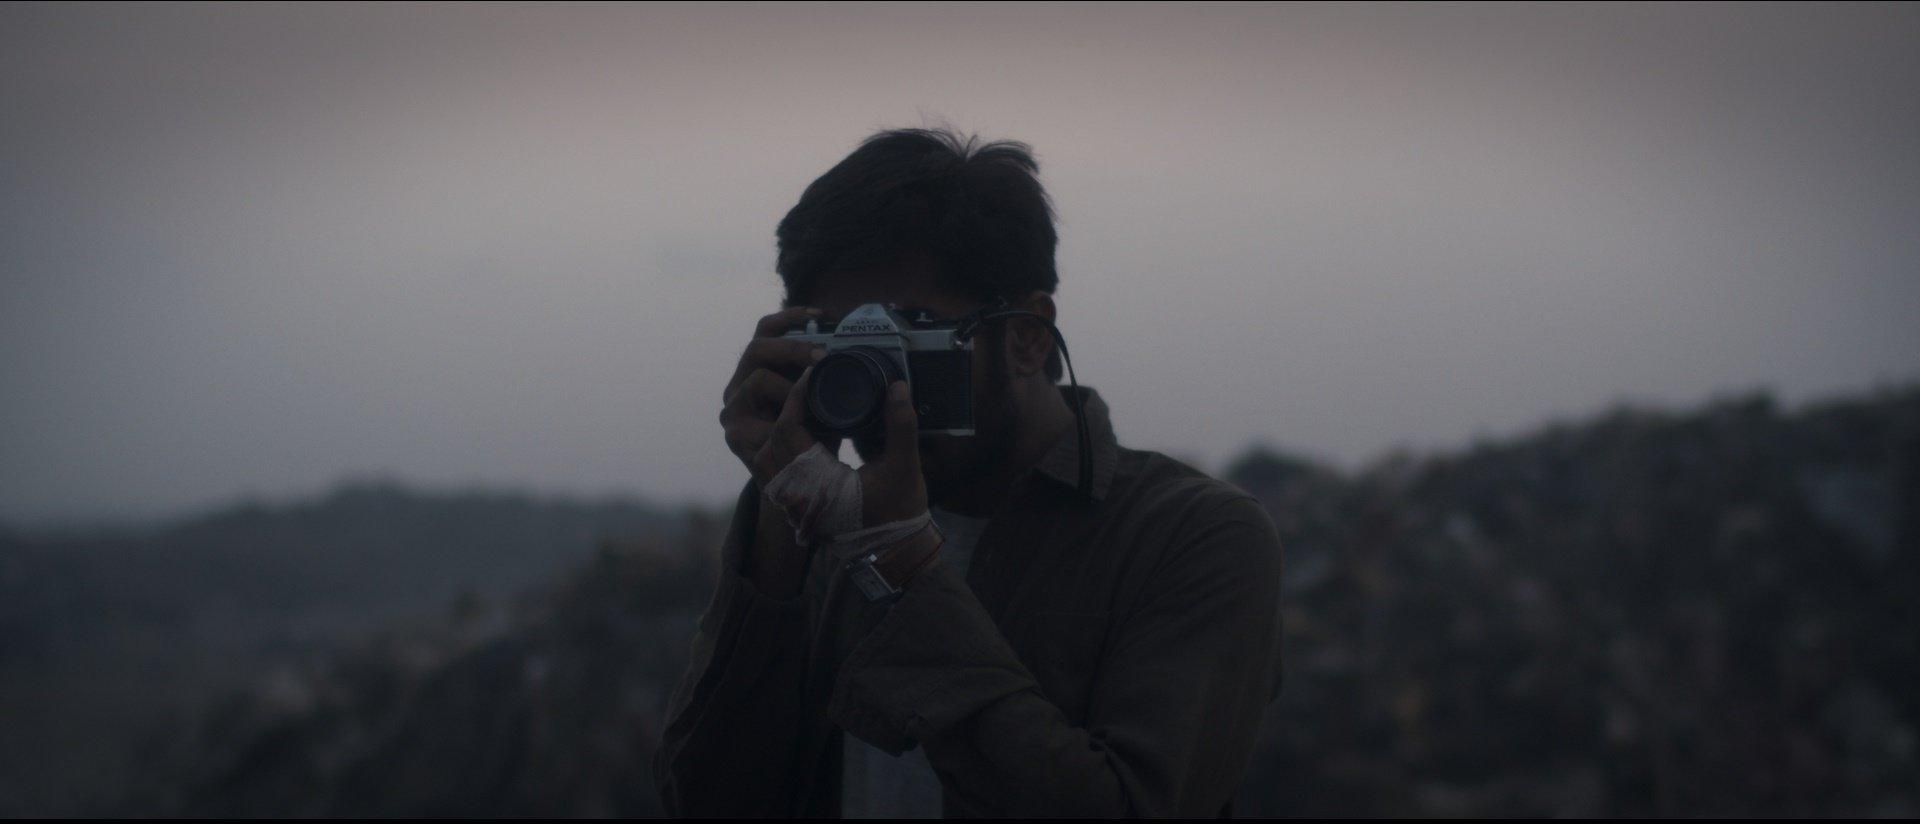 Srishti - India Story - MAMI 22nd Mumbai Film Festival